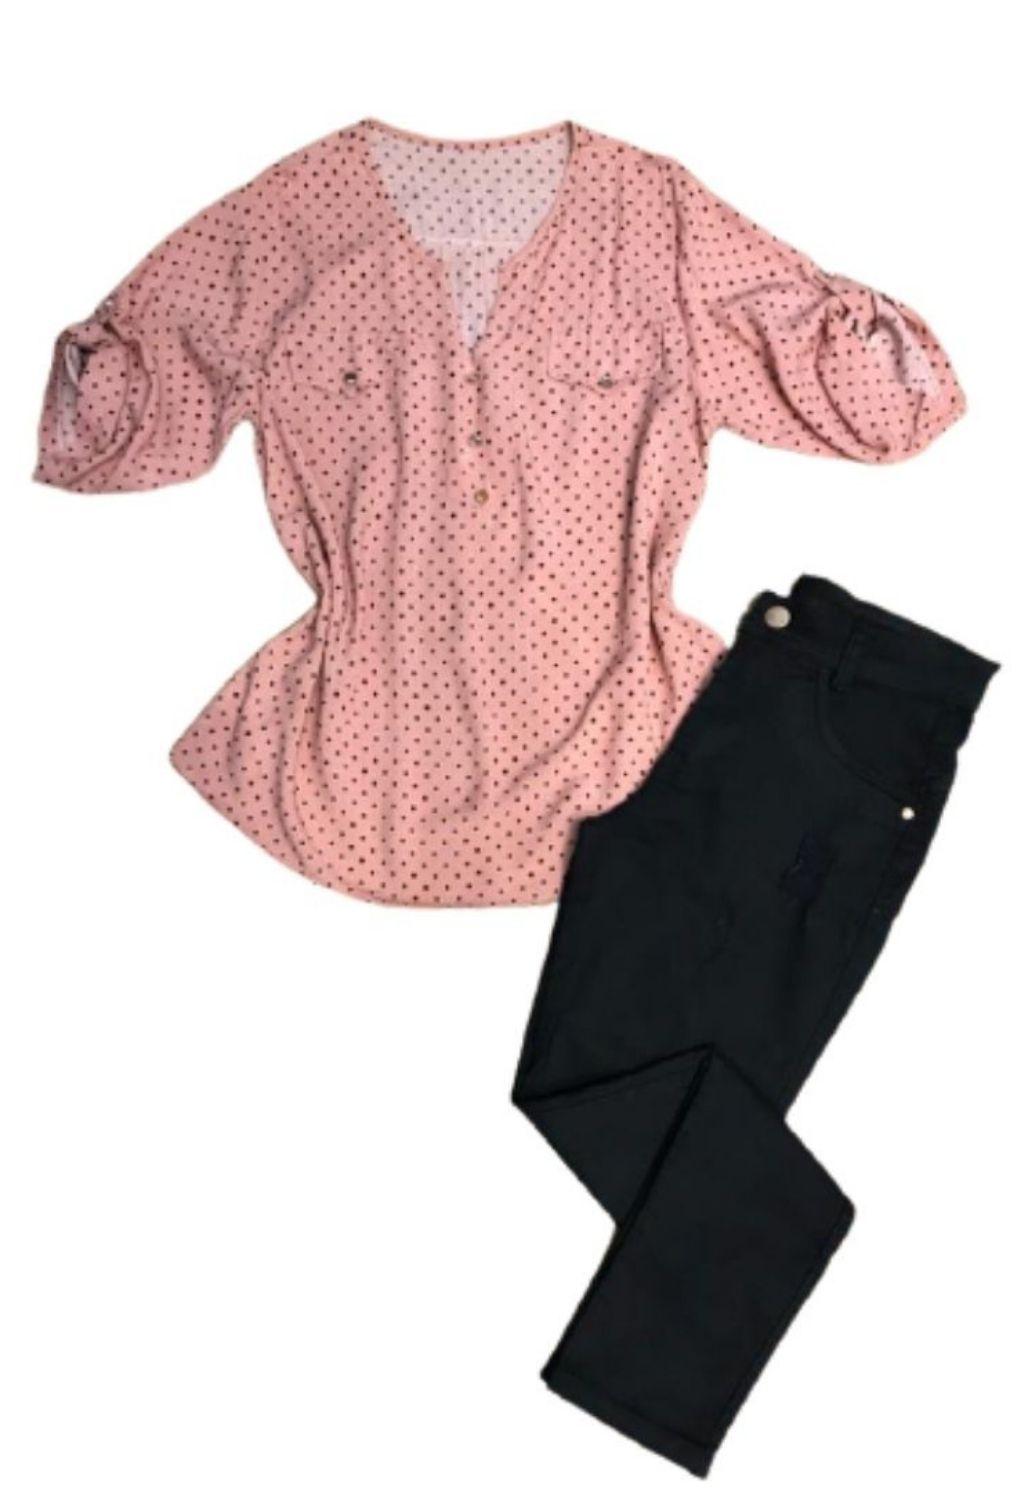 Camisa Blusa Feminina Manga Curta Social Sport Rosa Estampada  - ModaStore